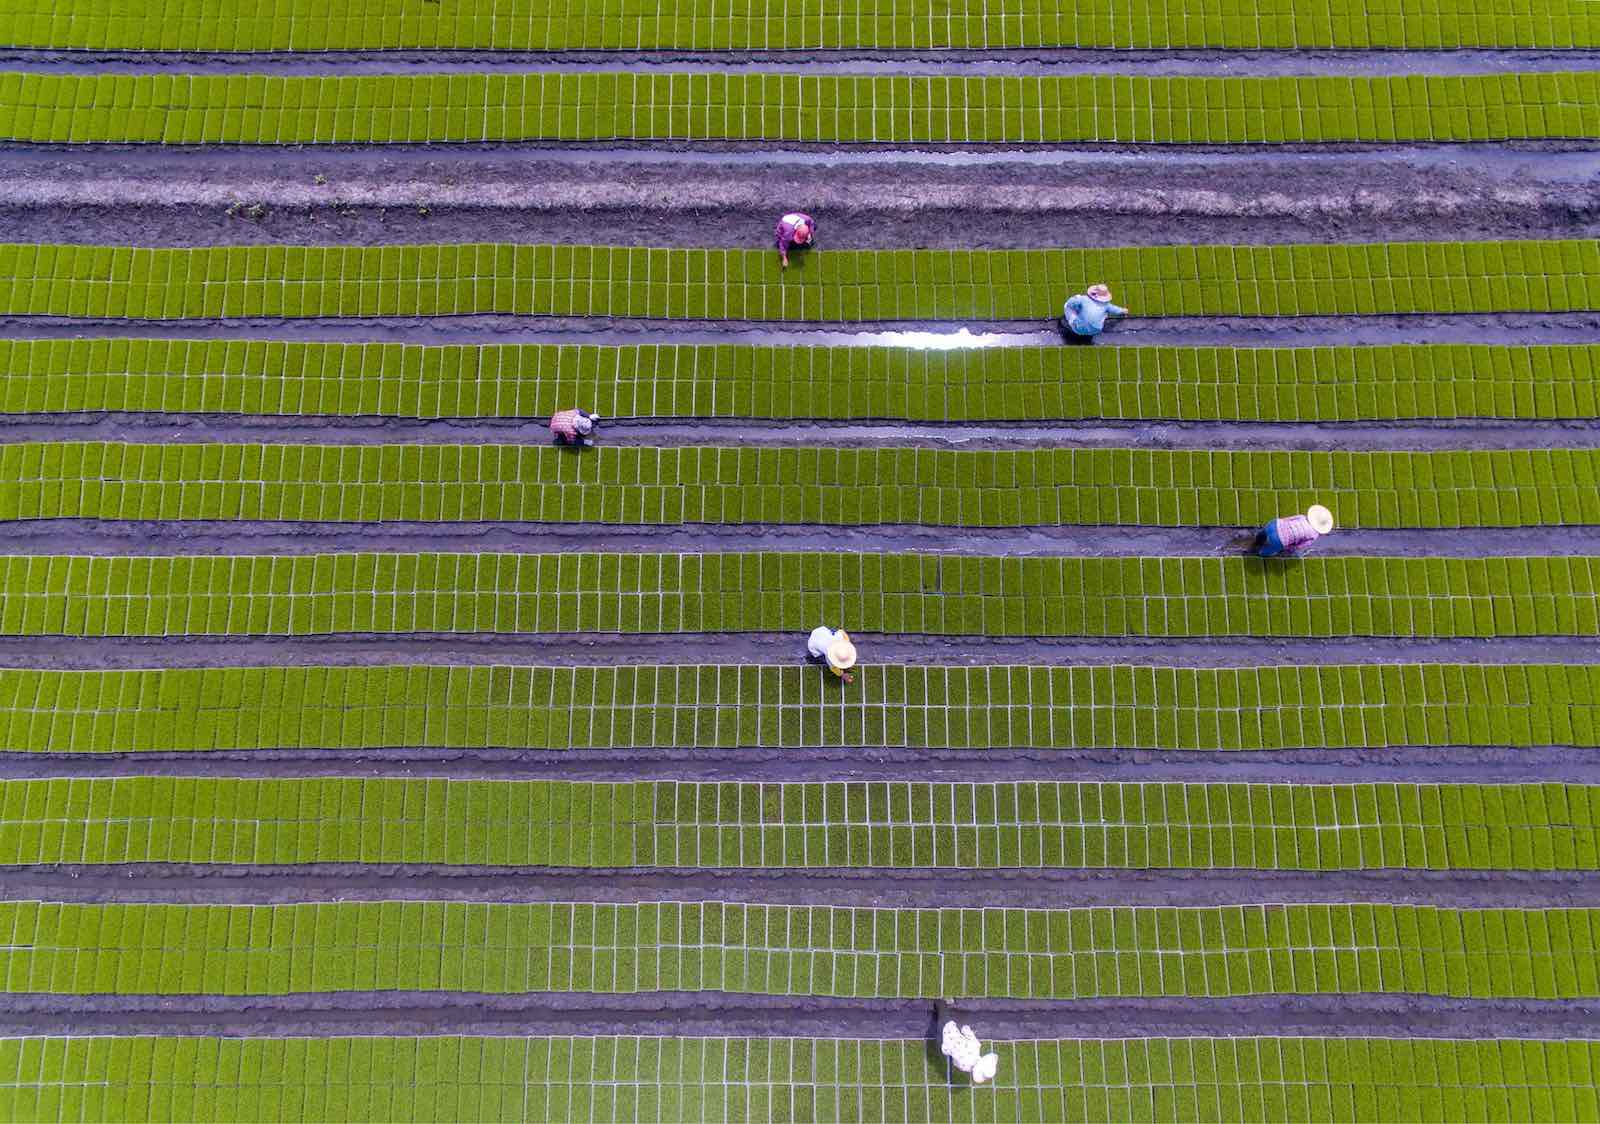 The harvest in June, Jiangsu, China (Photo: TPG/Getty)